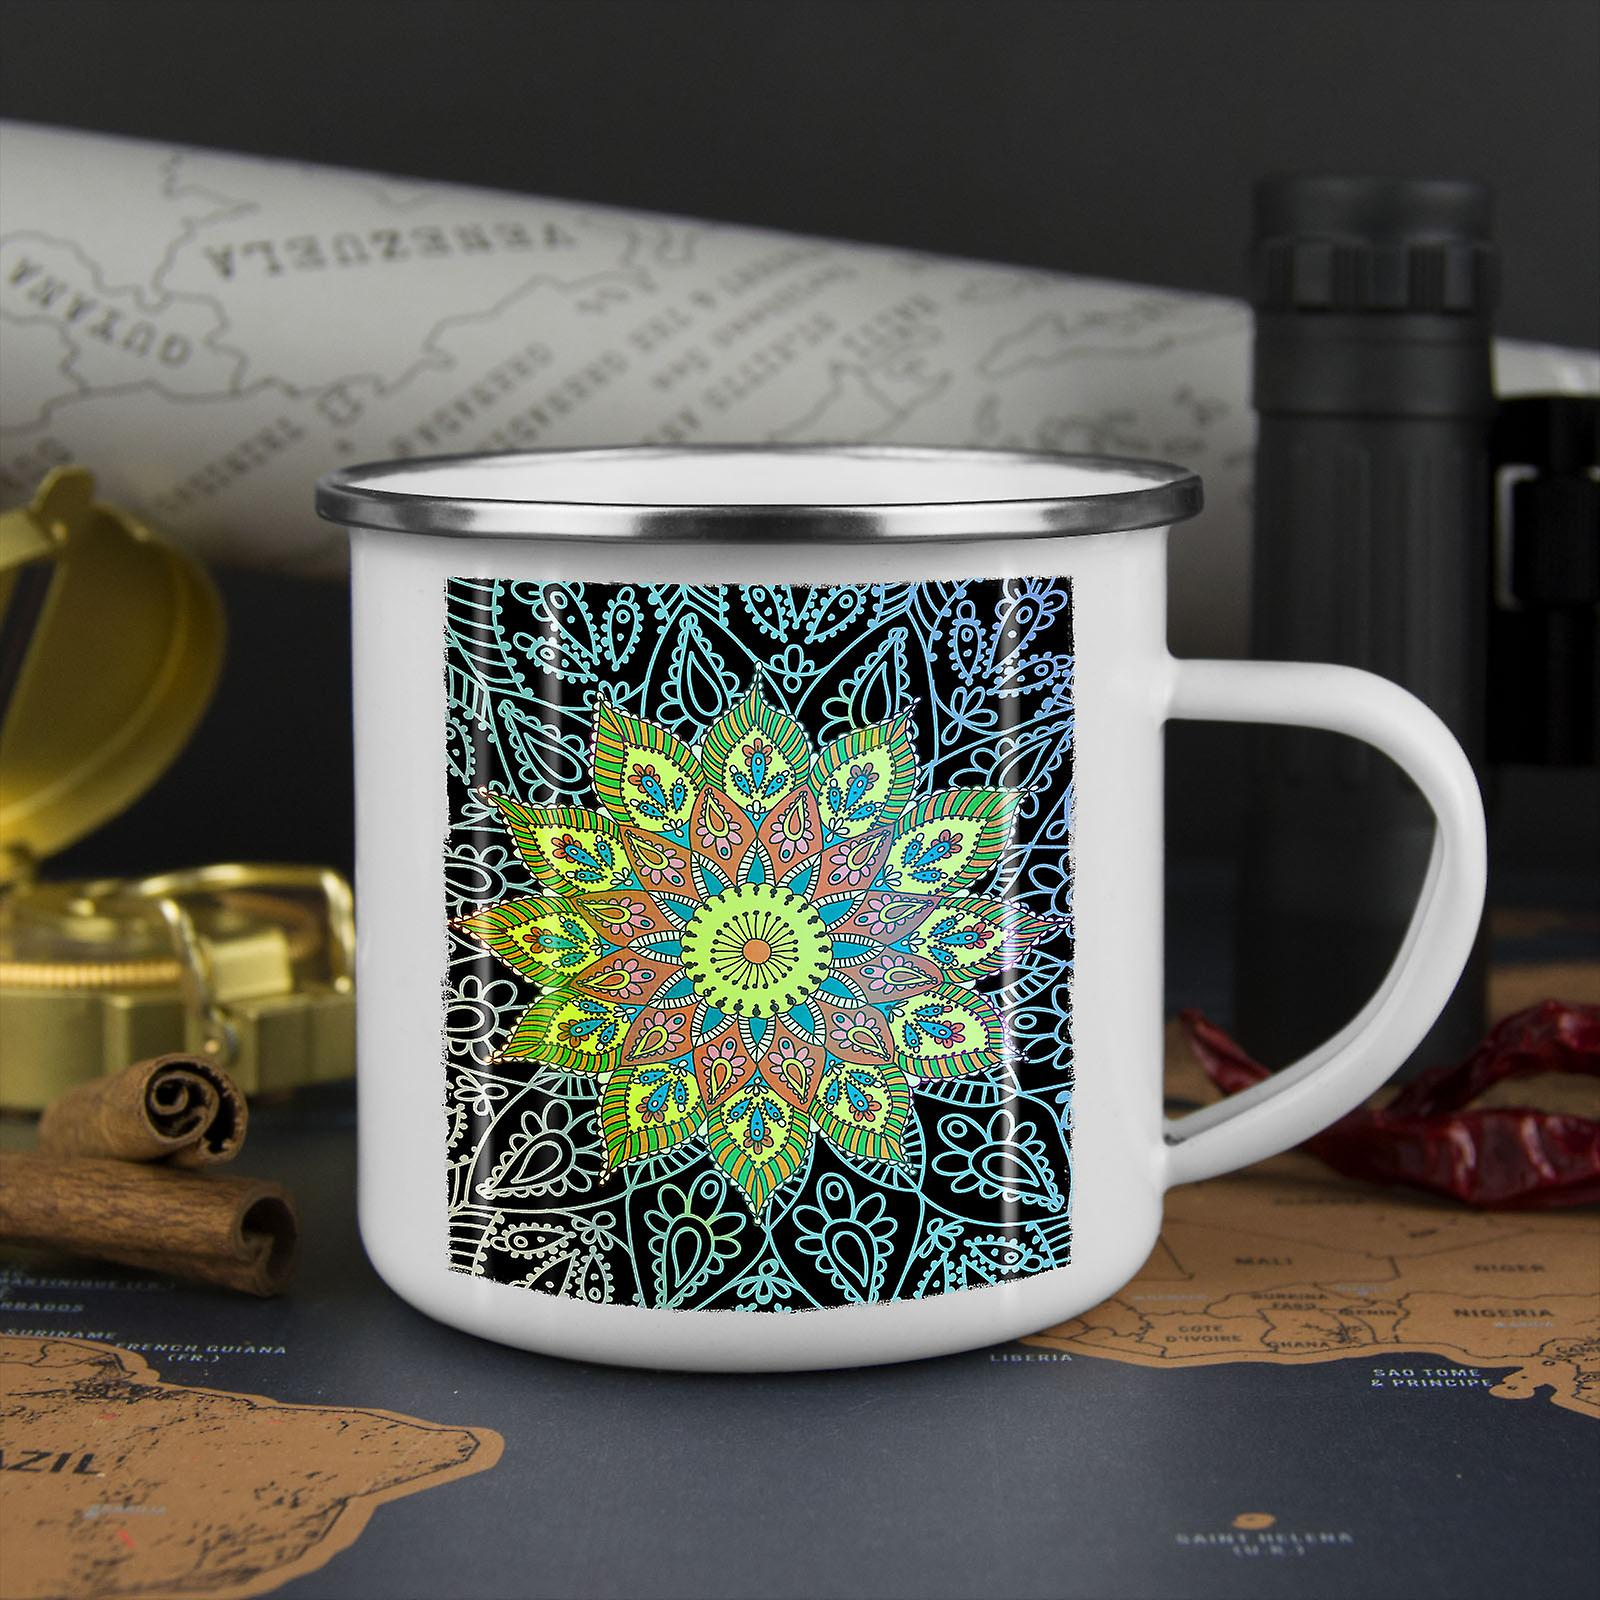 Indien-Schamanen-Mandala neue WhiteTea Kaffee Emaille Mug10 oz   Wellcoda